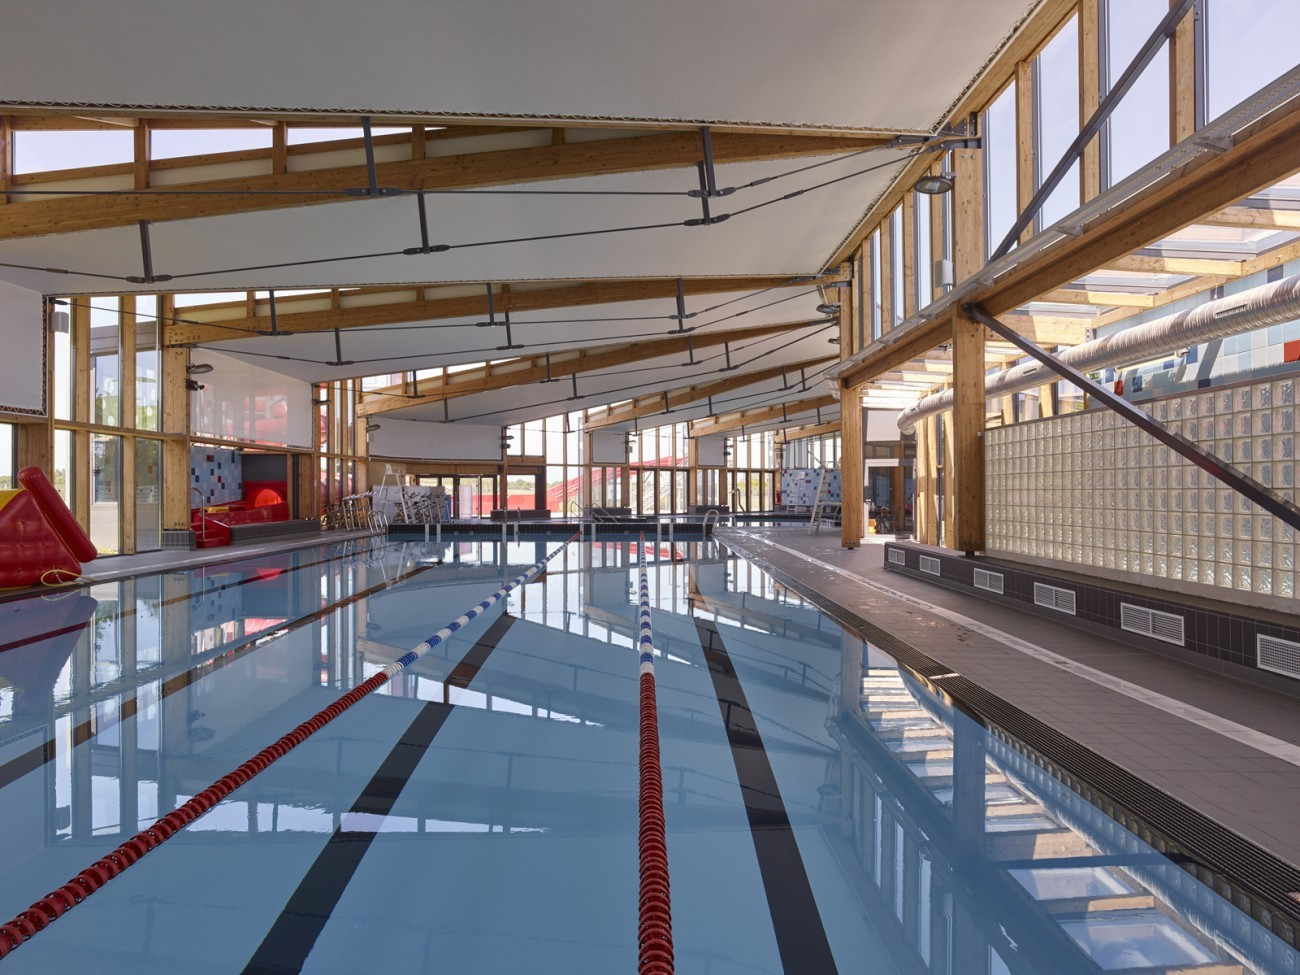 Cout piscine chauffee appartement condo vendre ville - Cout d une piscine couverte ...